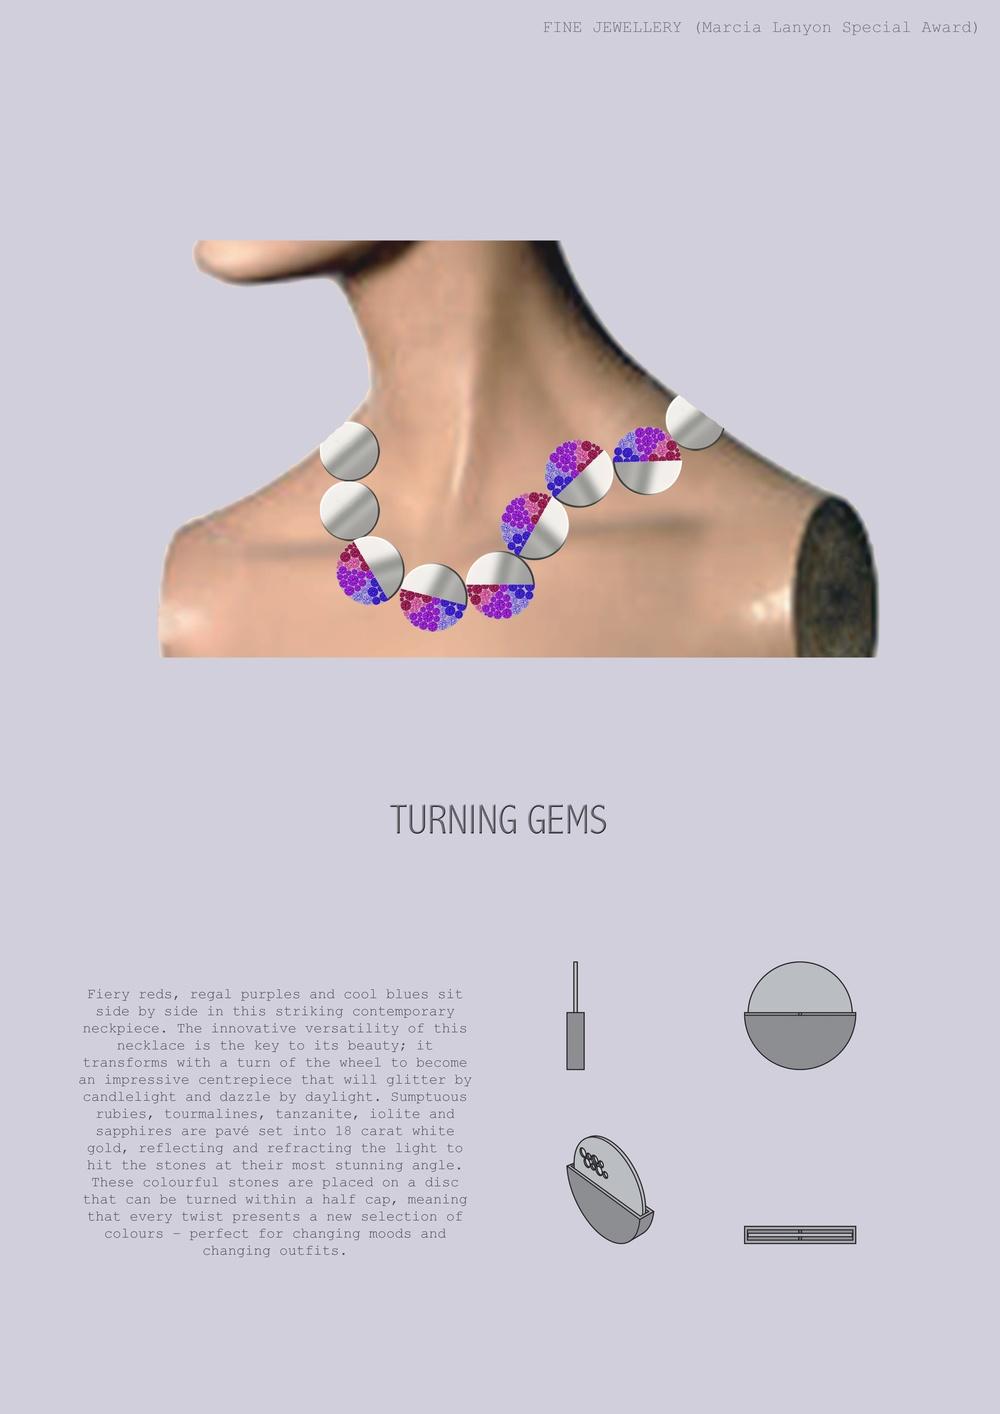 alma sophia design Marcey Lanyon presentation .jpg